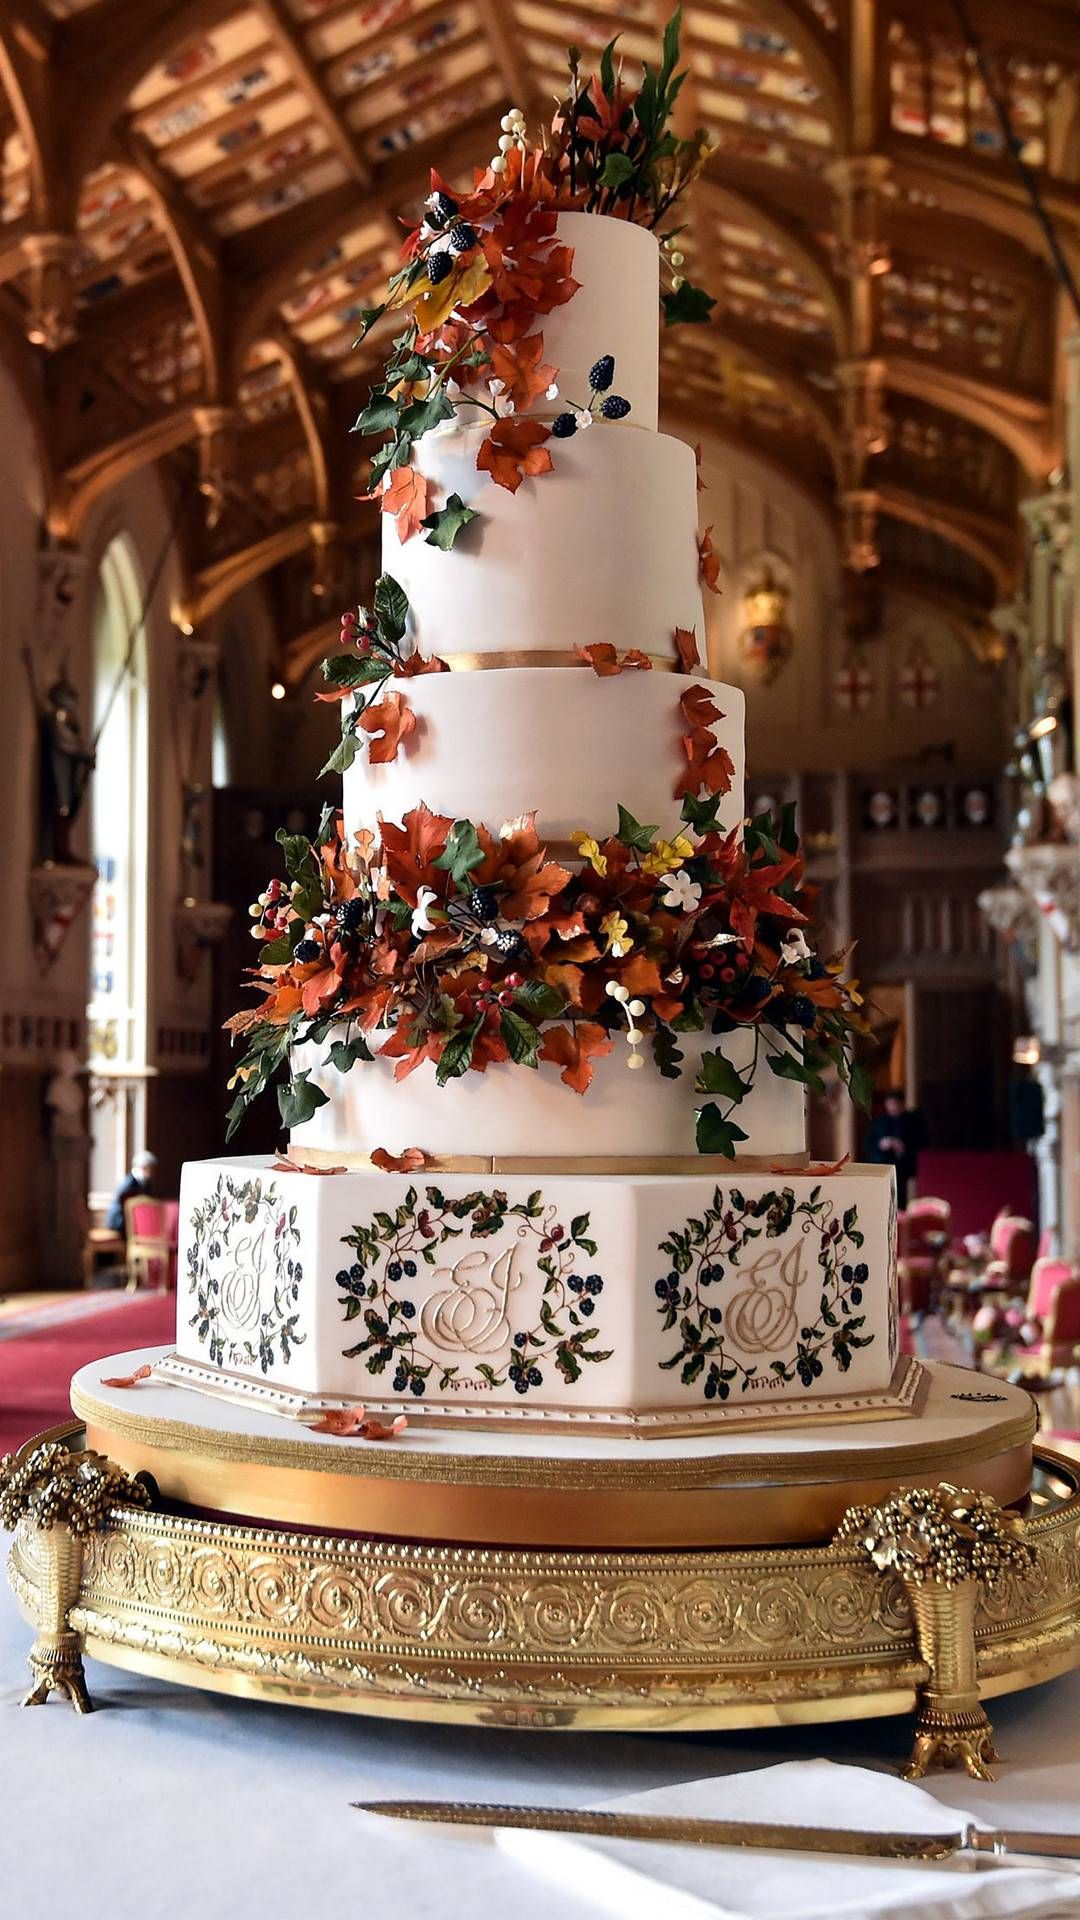 Diy wedding decorations vintage october 2018 Royal Wedding Cake from Princess Eugenie and Jack Brooksbankus Royal